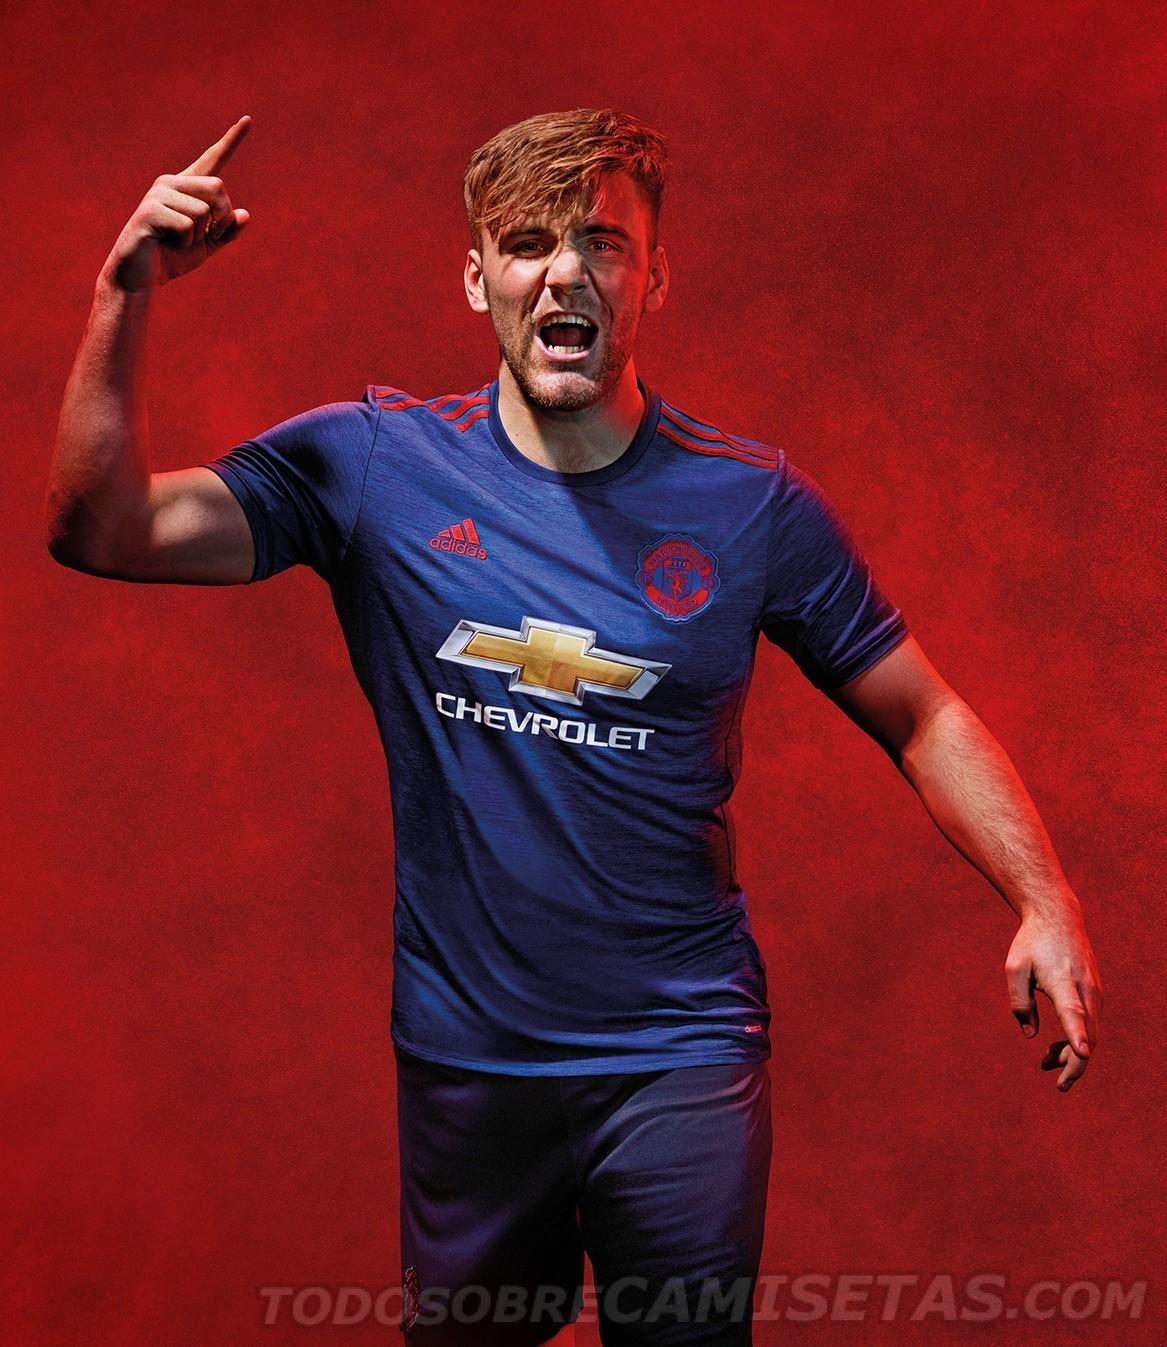 Manchester-United-2016-17-adidas-new-away-kit-9.jpg